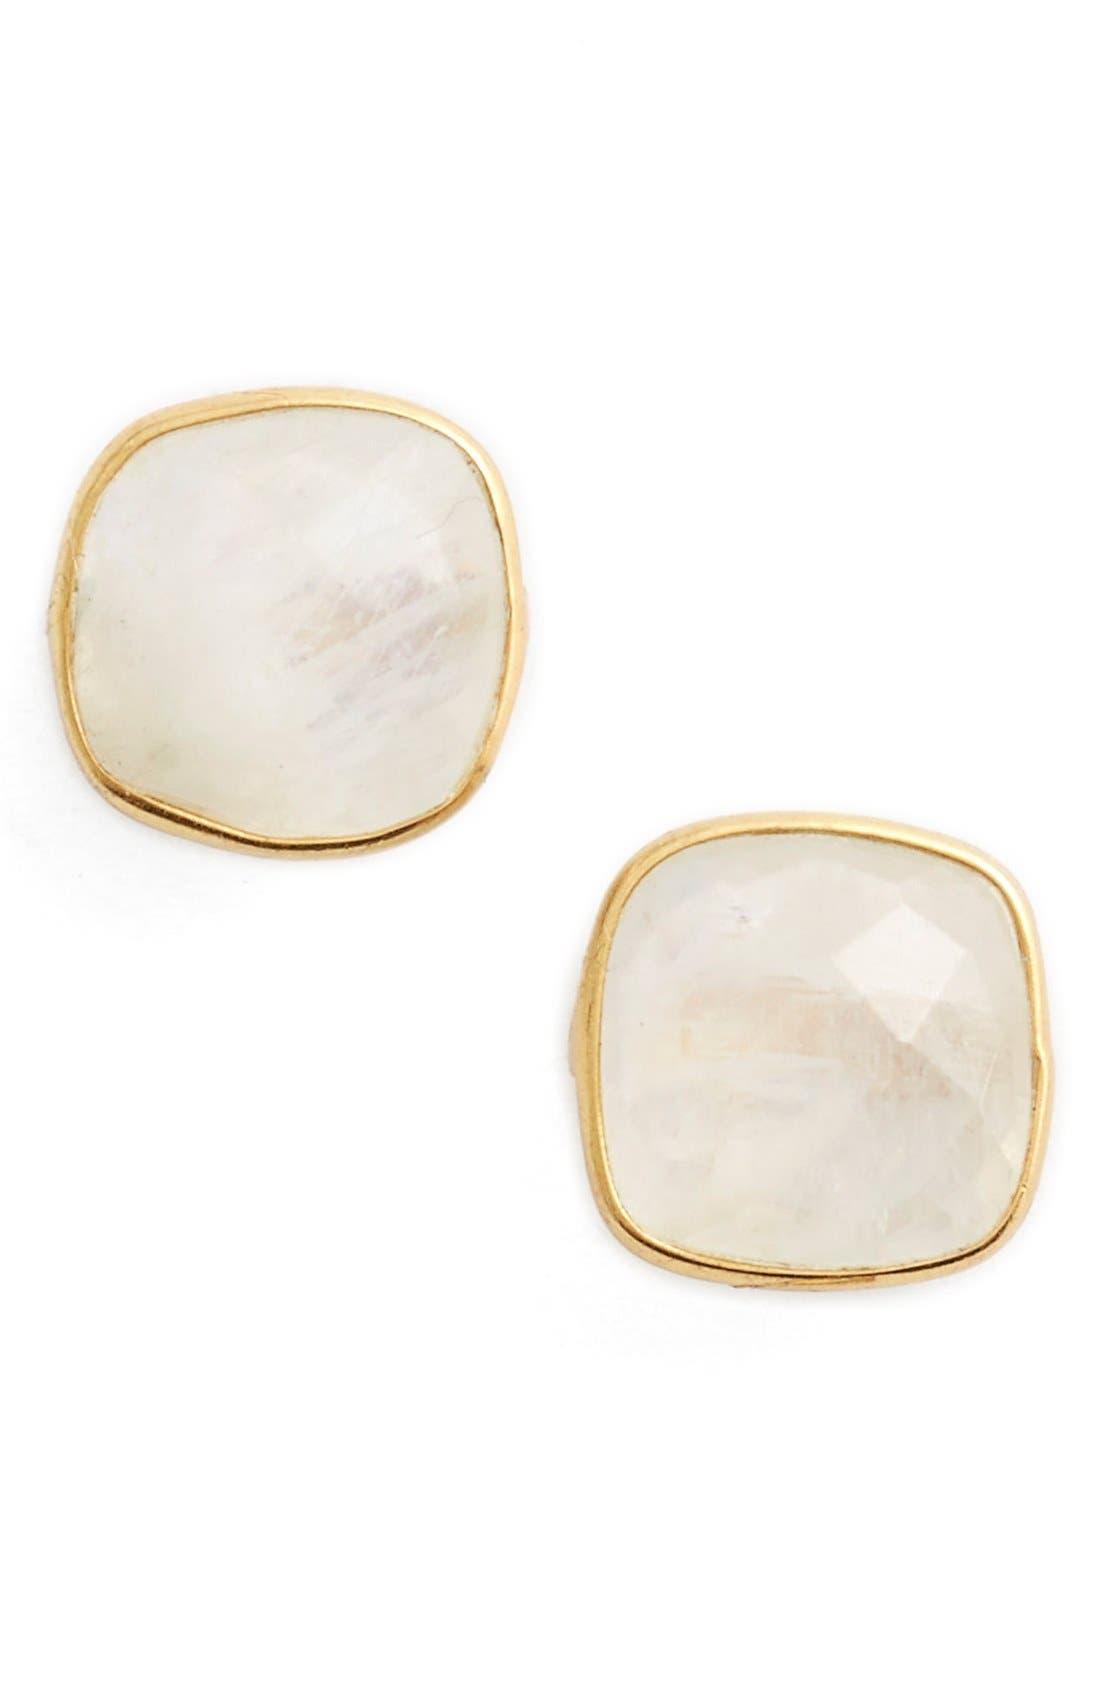 Semiprecious Stone Stud Earrings,                         Main,                         color, Gold/ Moonstone